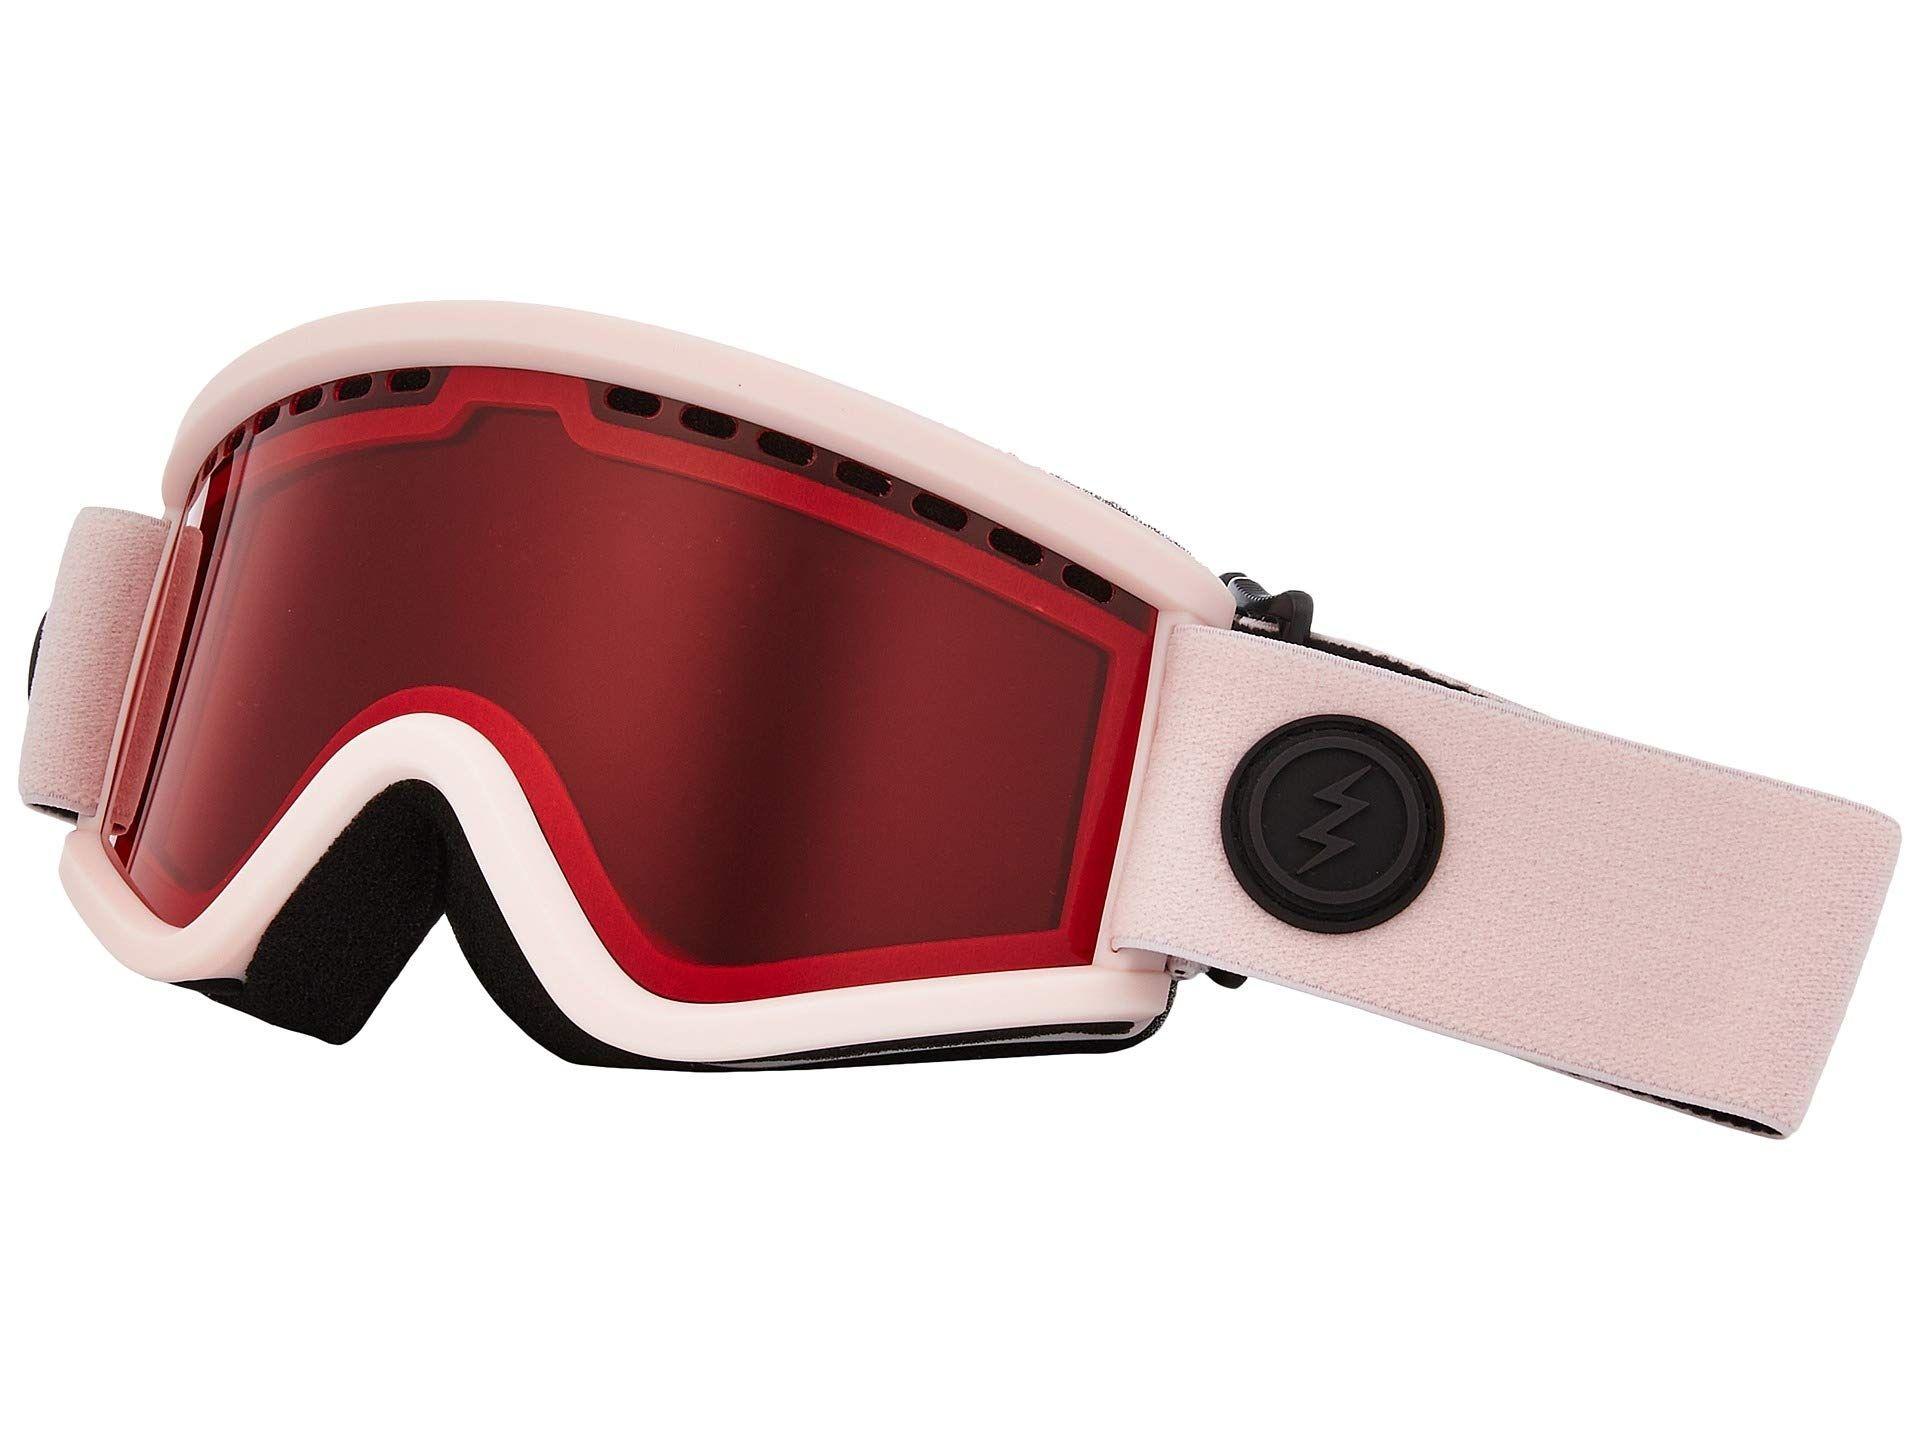 32f4361f8 سعر Polaroid Youth Polarized Wayfarer Unisex Sunglasses - P8400 MLR ...